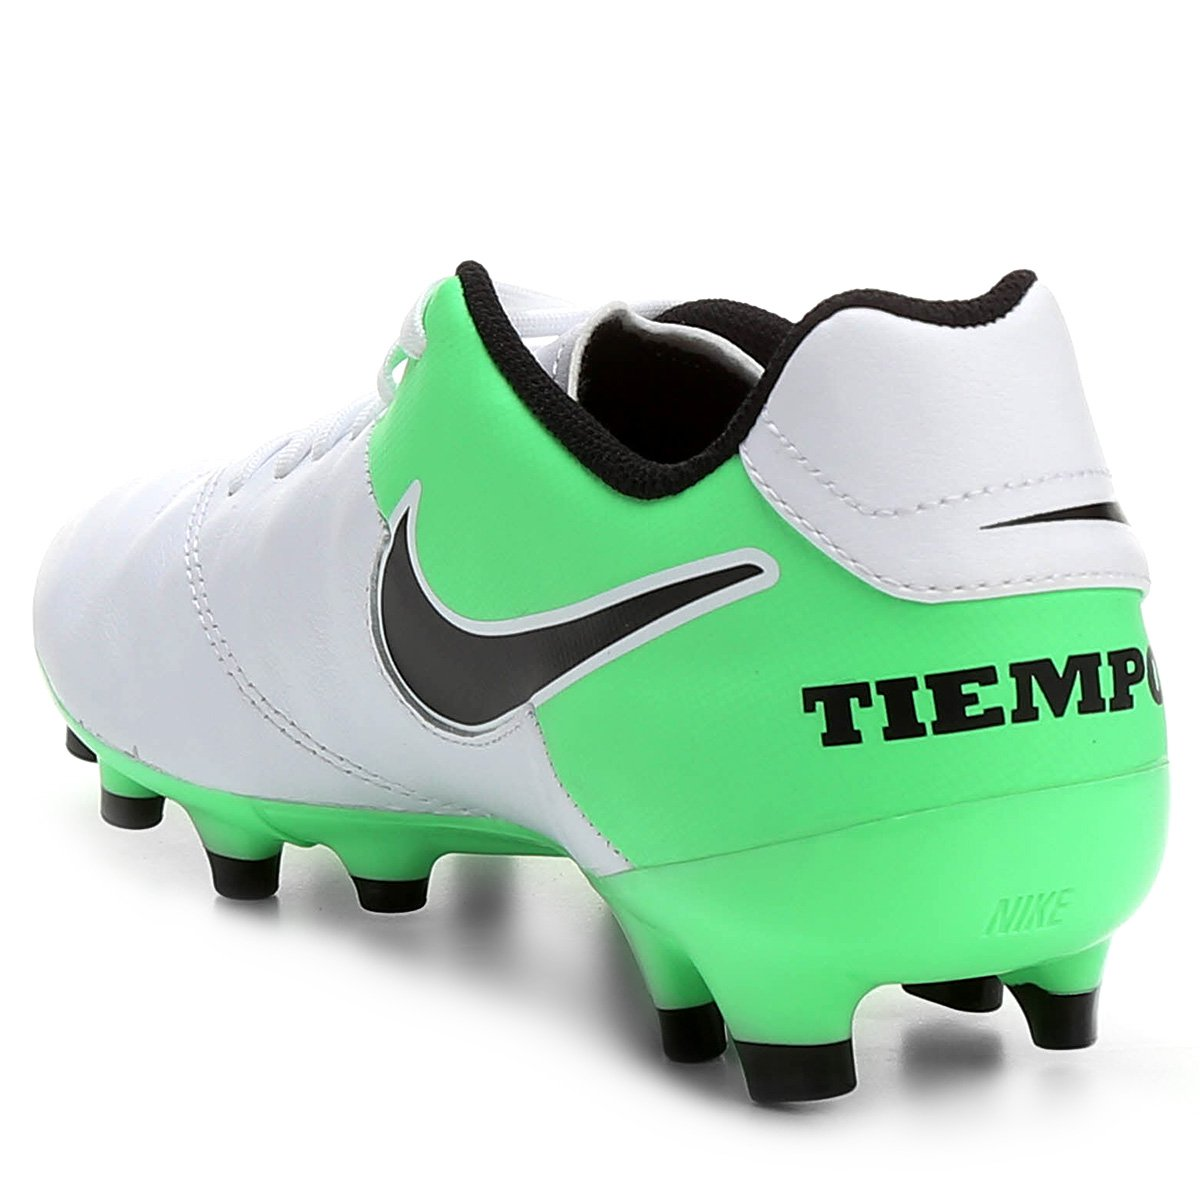 cb414d0c94 Chuteira Campo Nike Tiempo Genio 2 Leather FG - Compre Agora